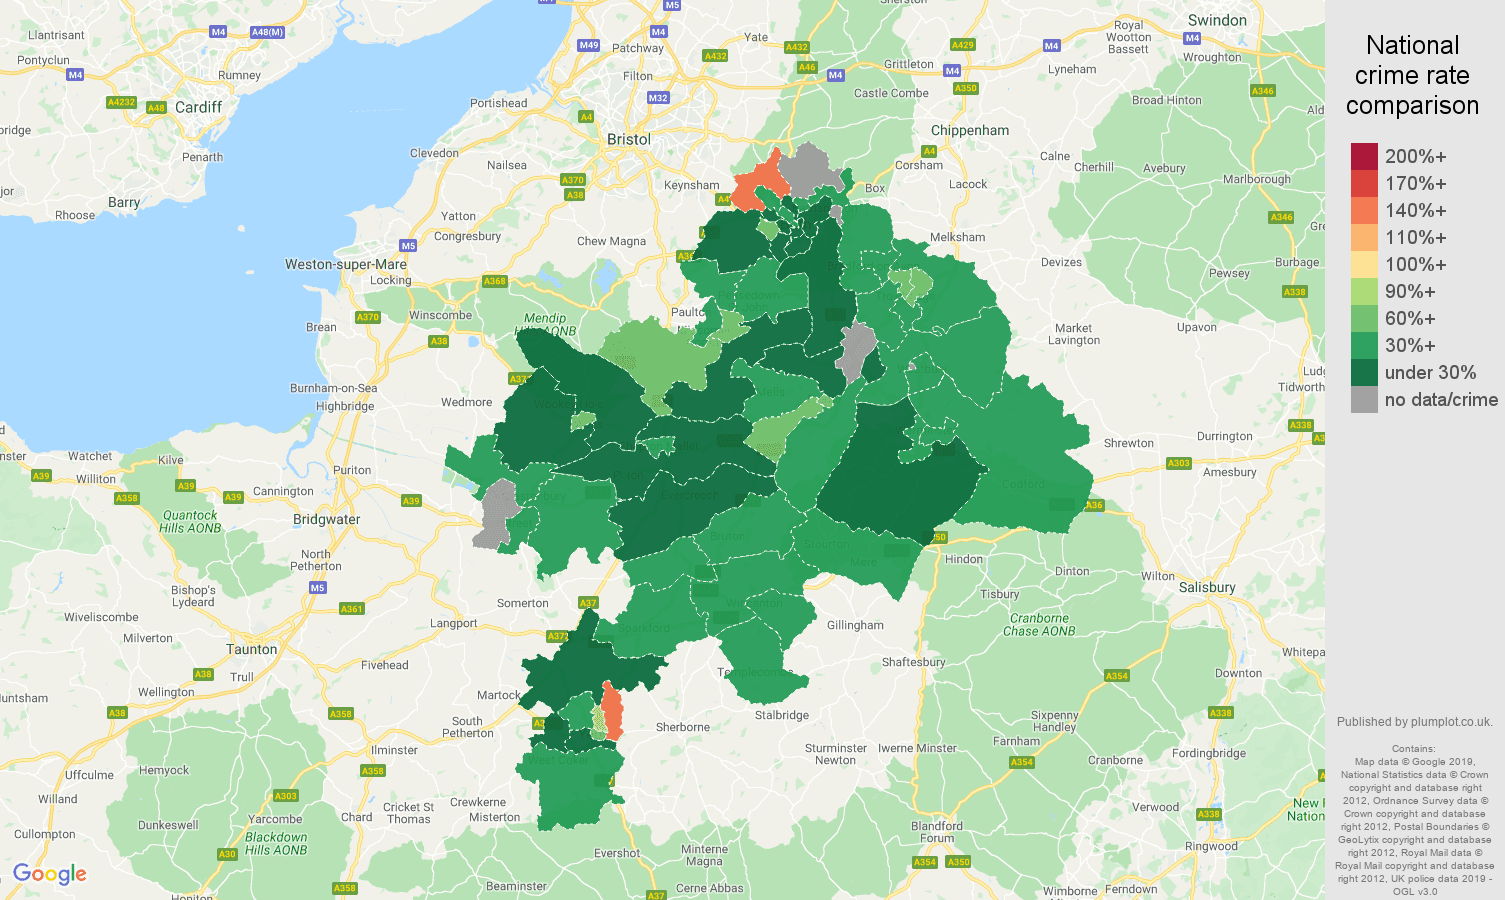 Bath other crime rate comparison map